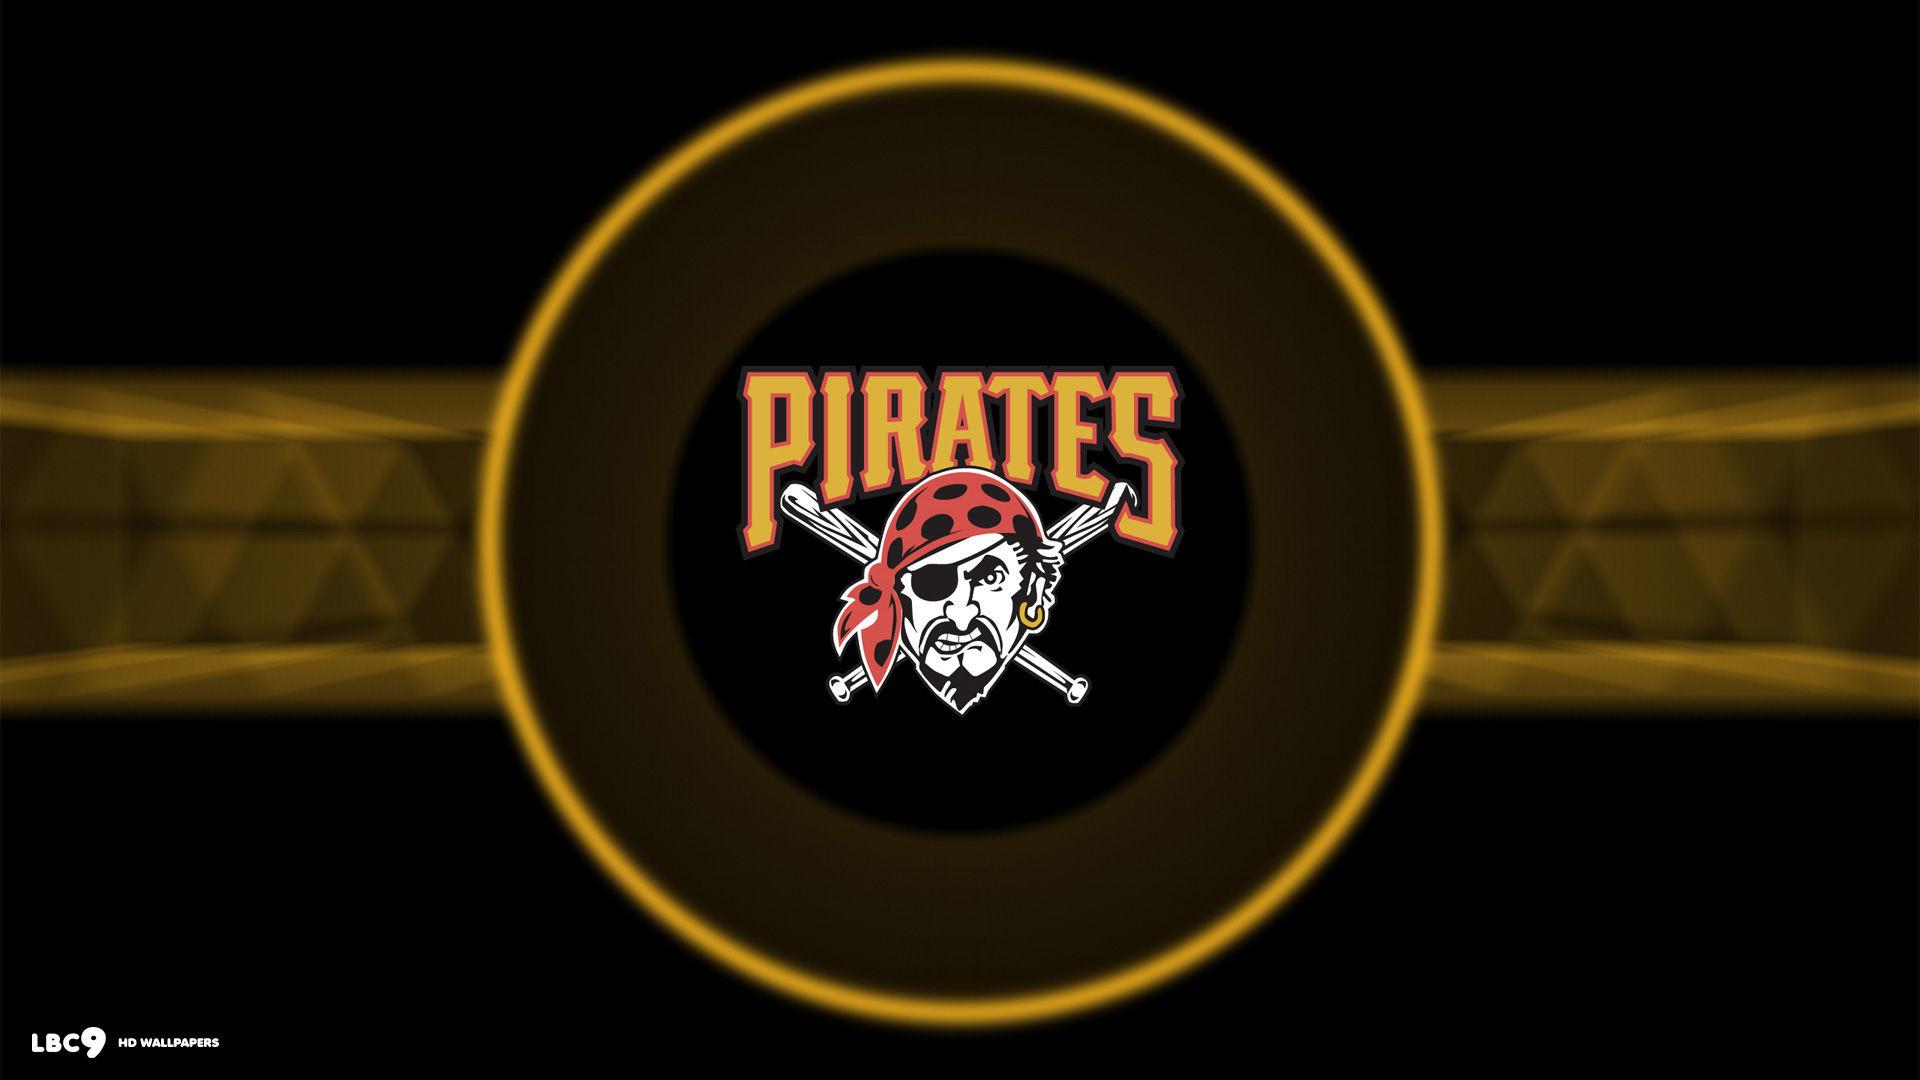 Pittsburgh Steelers Iphone Wallpaper Pittsburgh Pirates Wallpaper Desktop 2018 66 Images